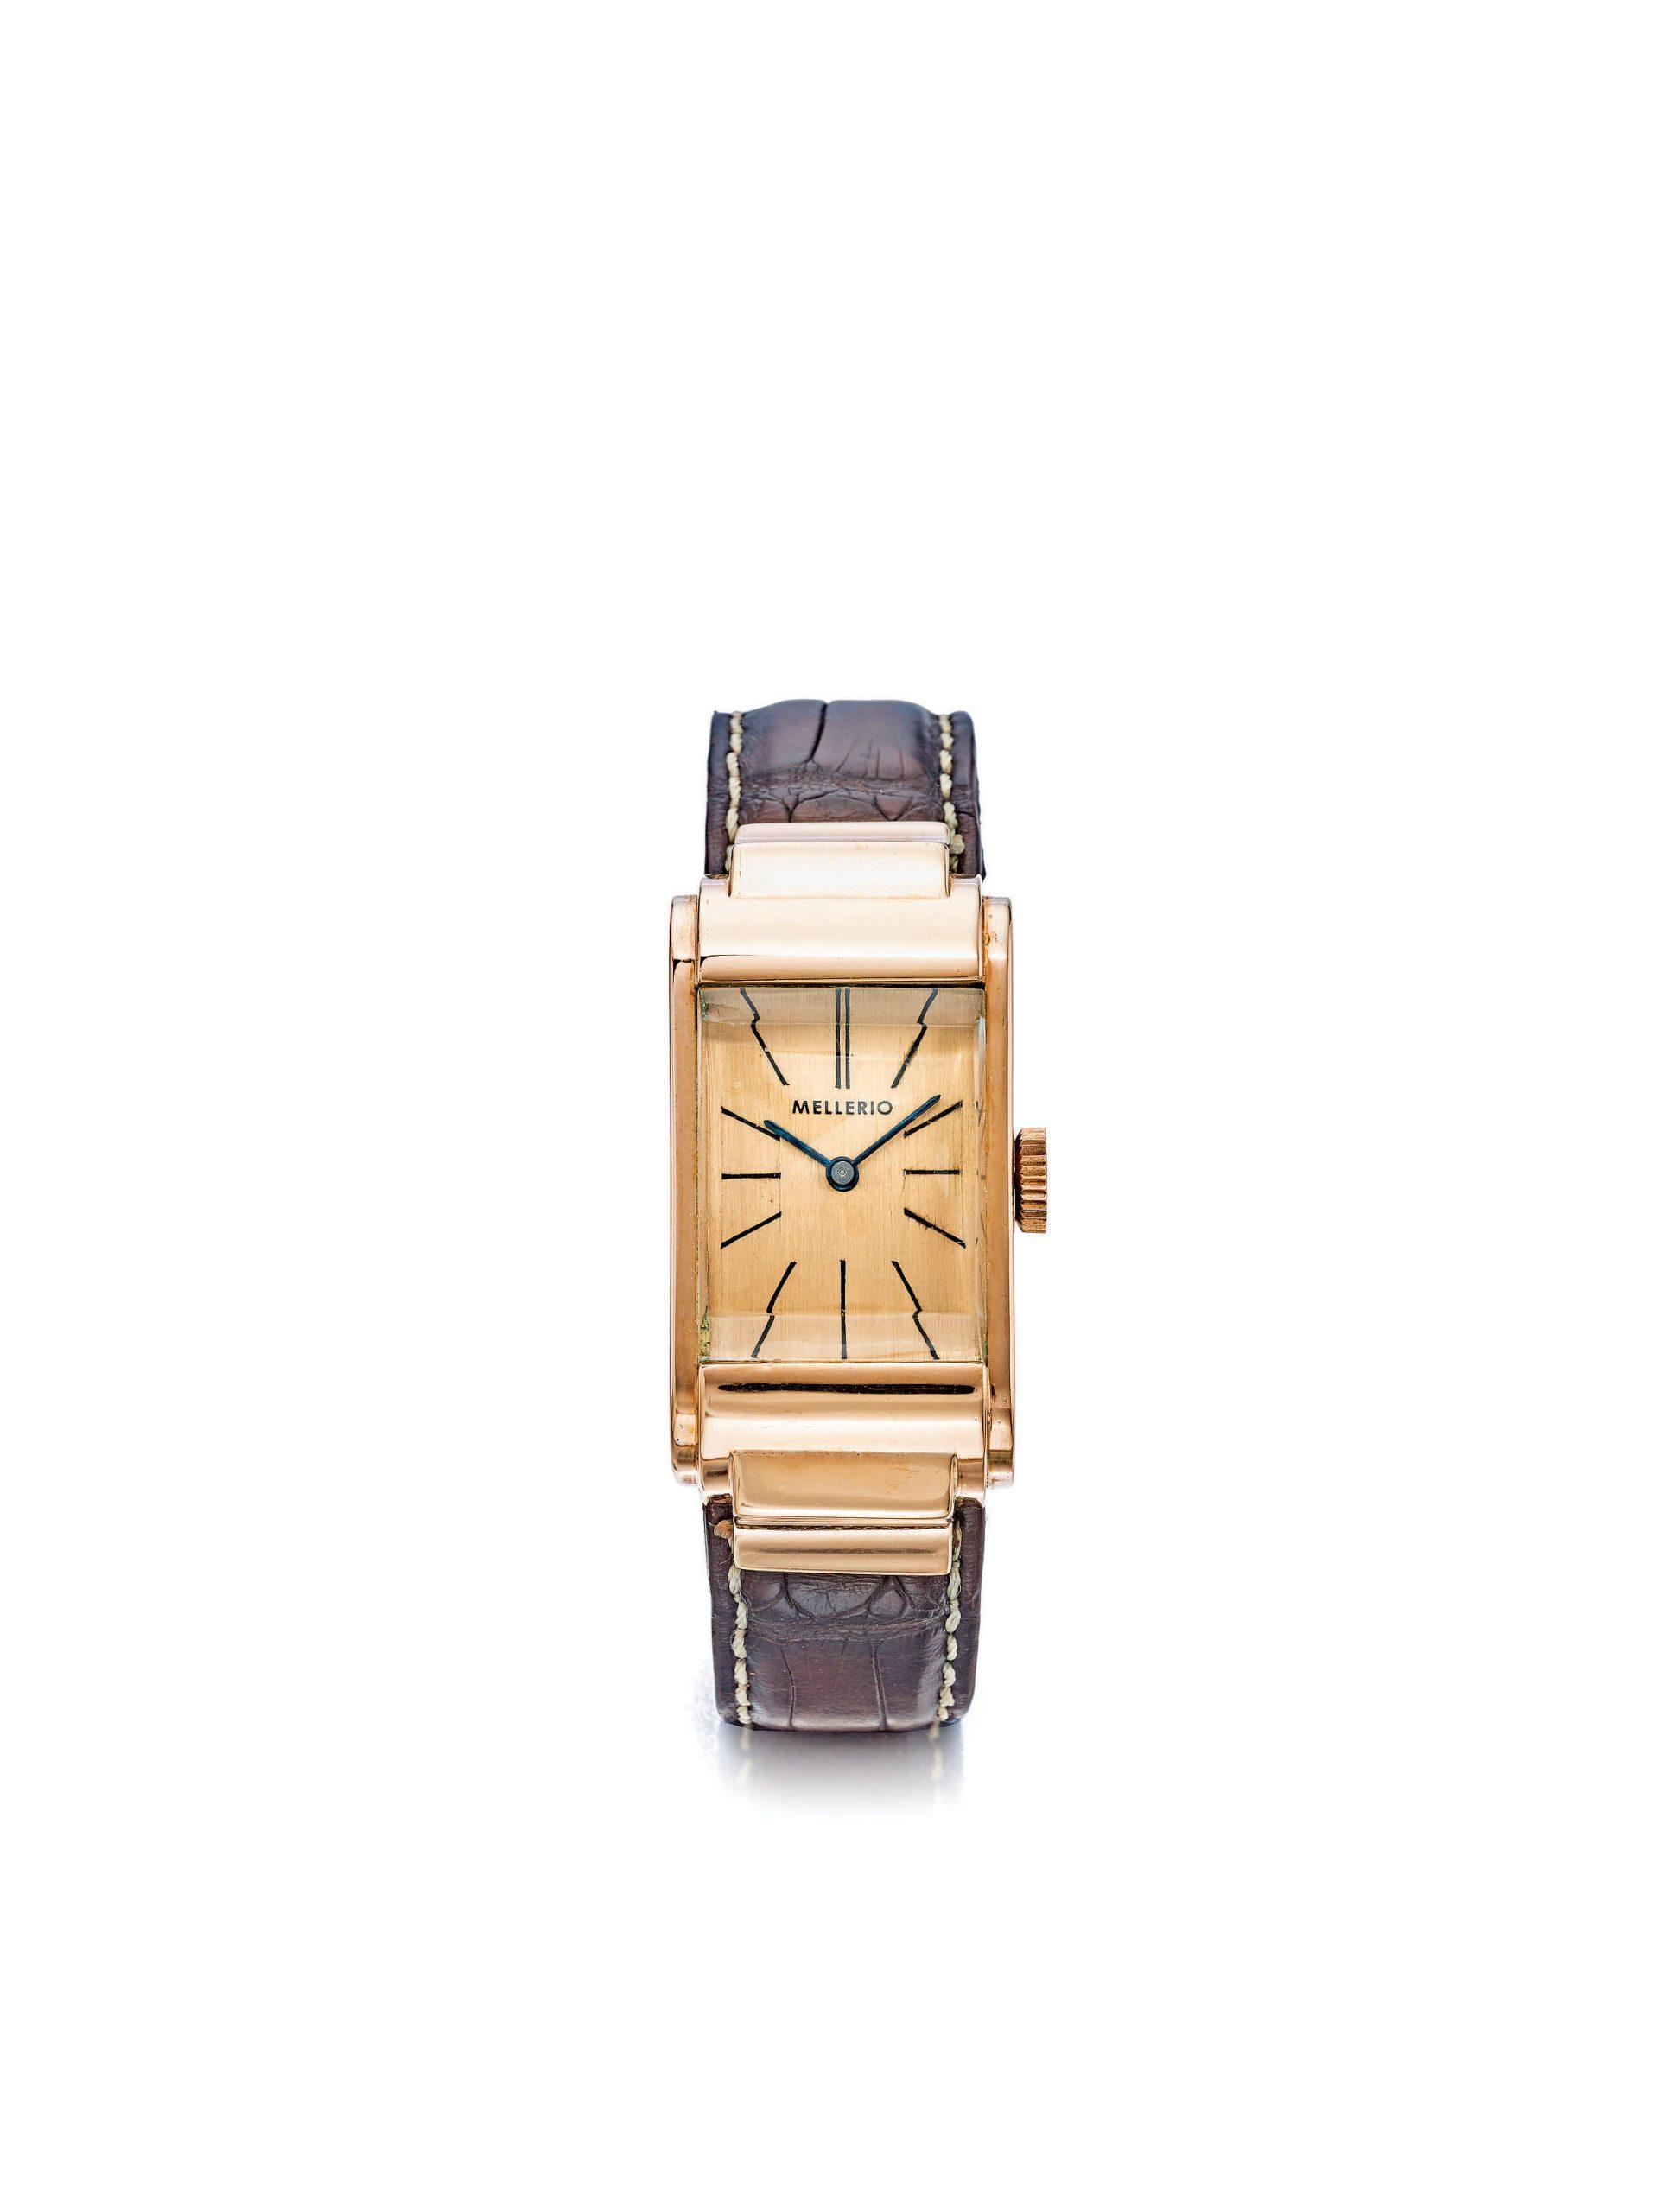 Mellerio Pink Gold Rectangular wristwatch